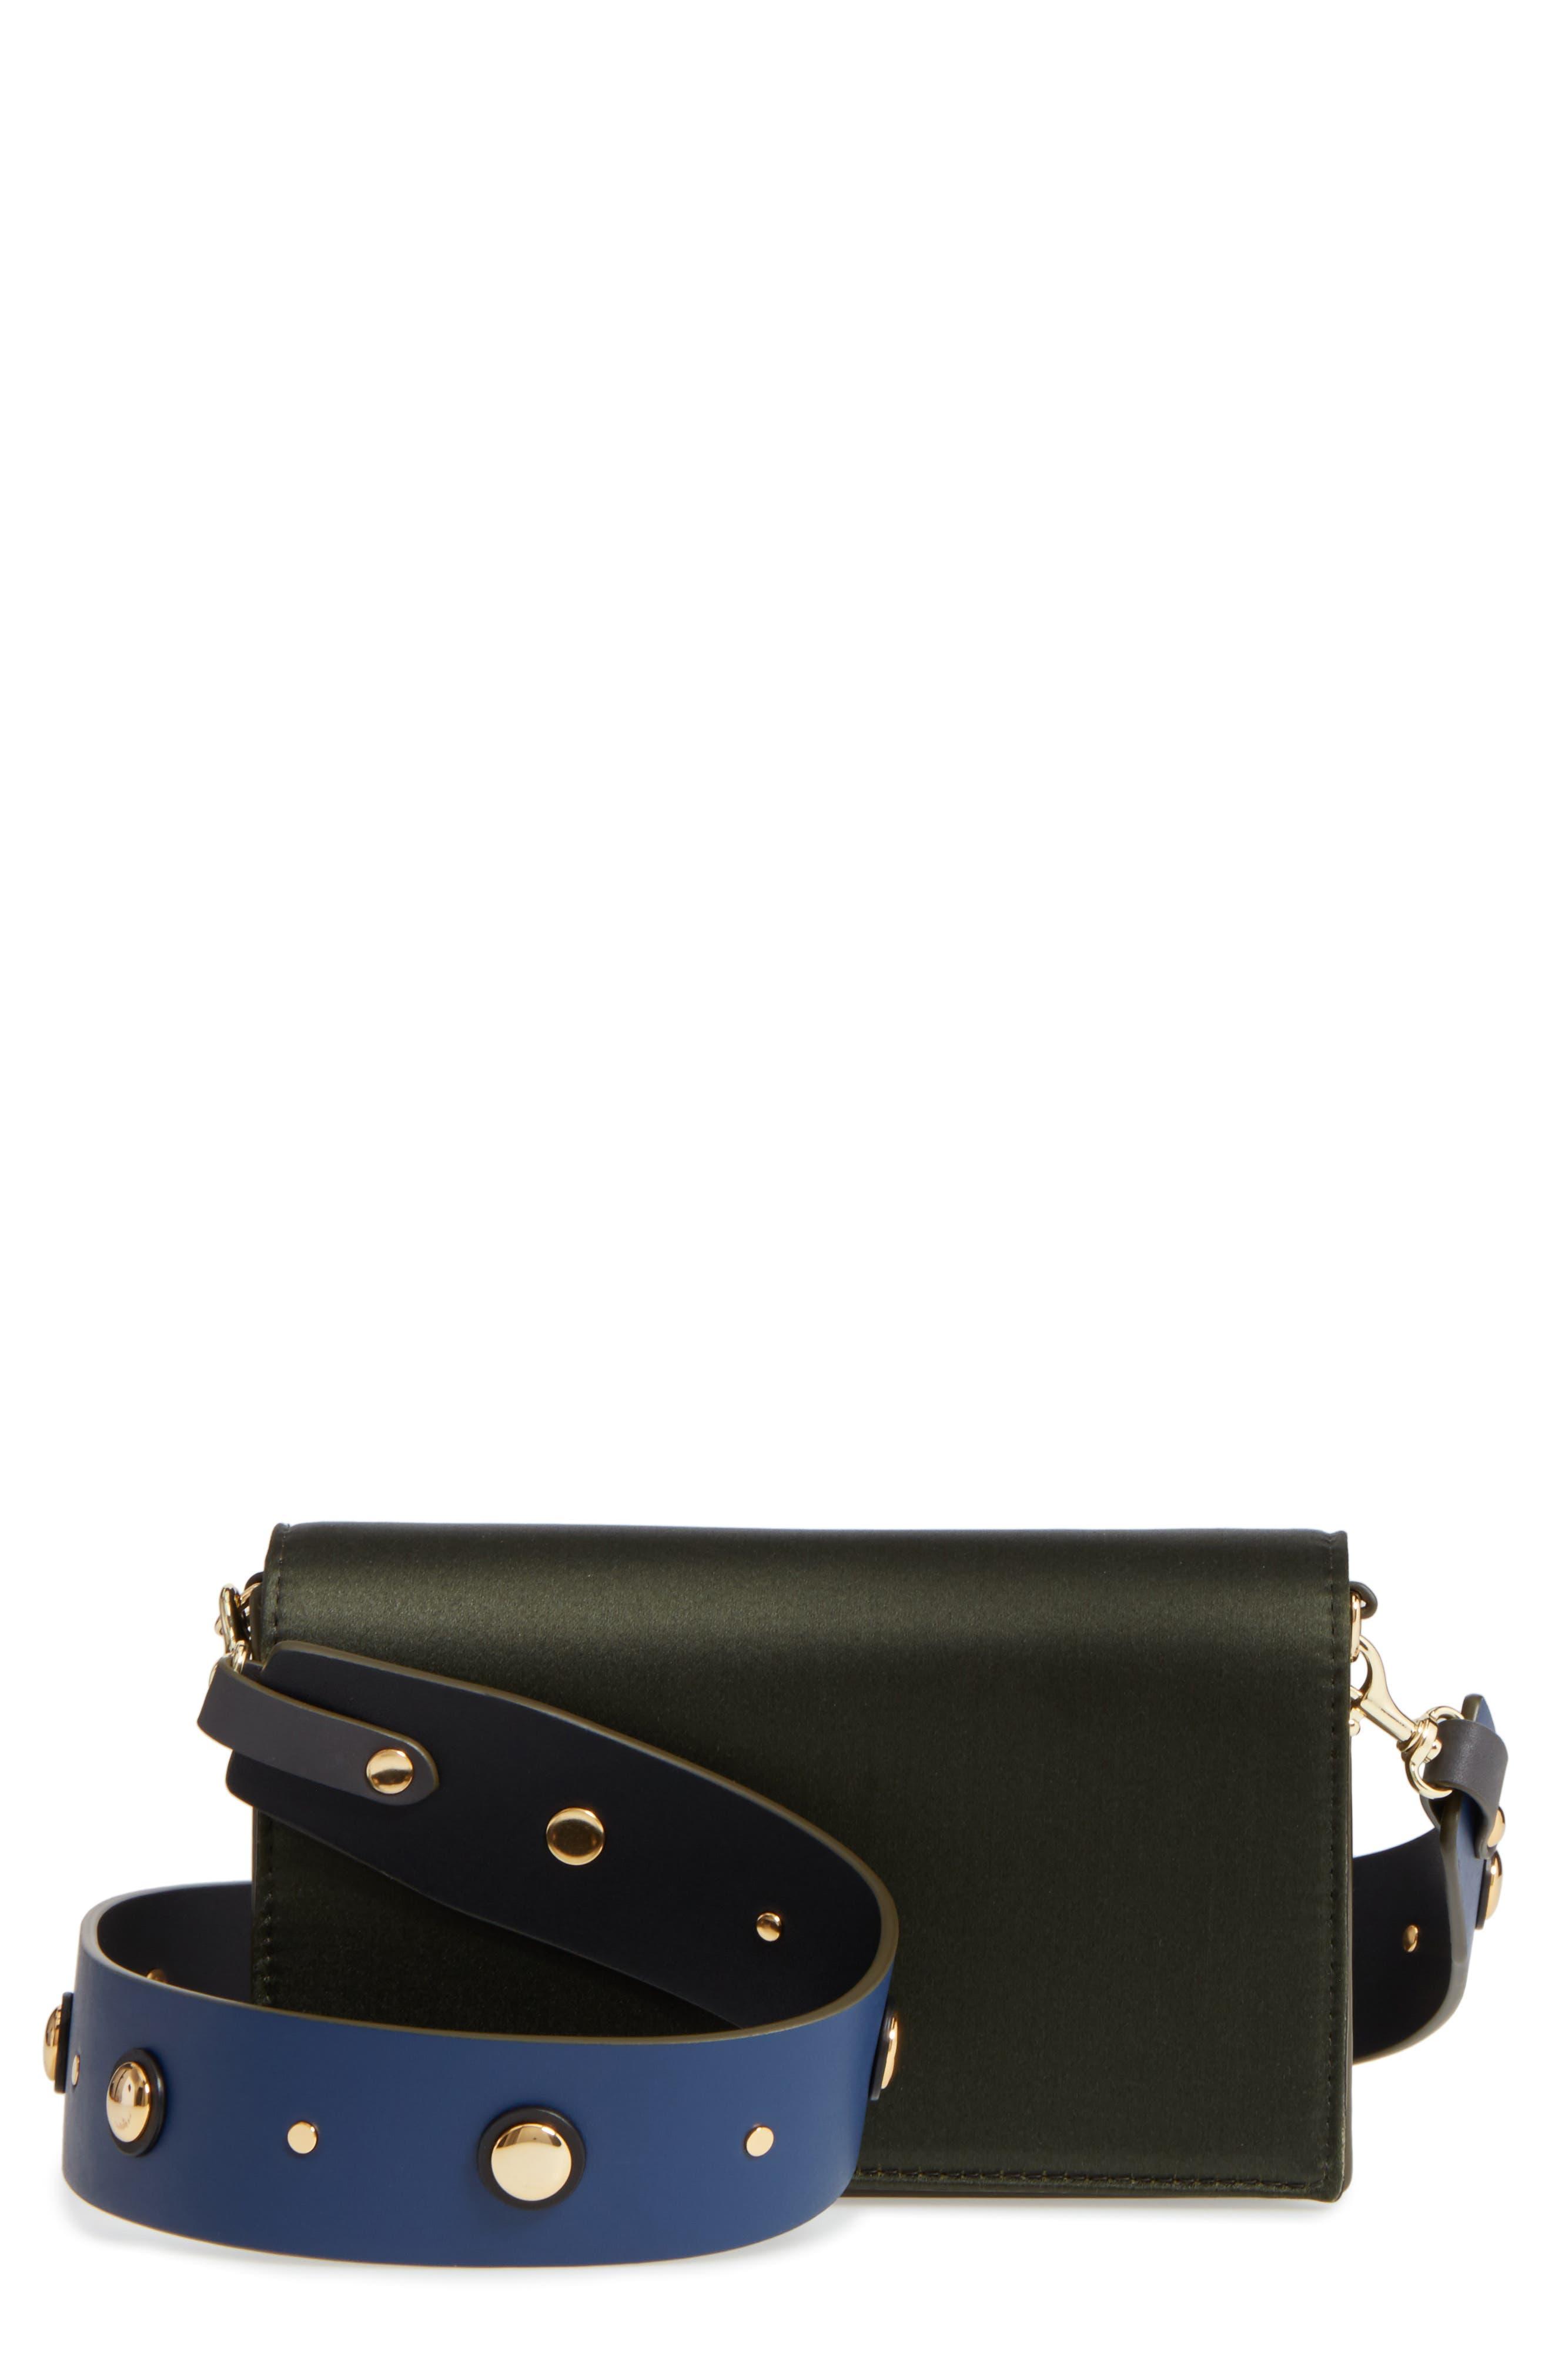 Main Image - Diane von Furstenberg Soirée Satin Convertible Crossbody Bag